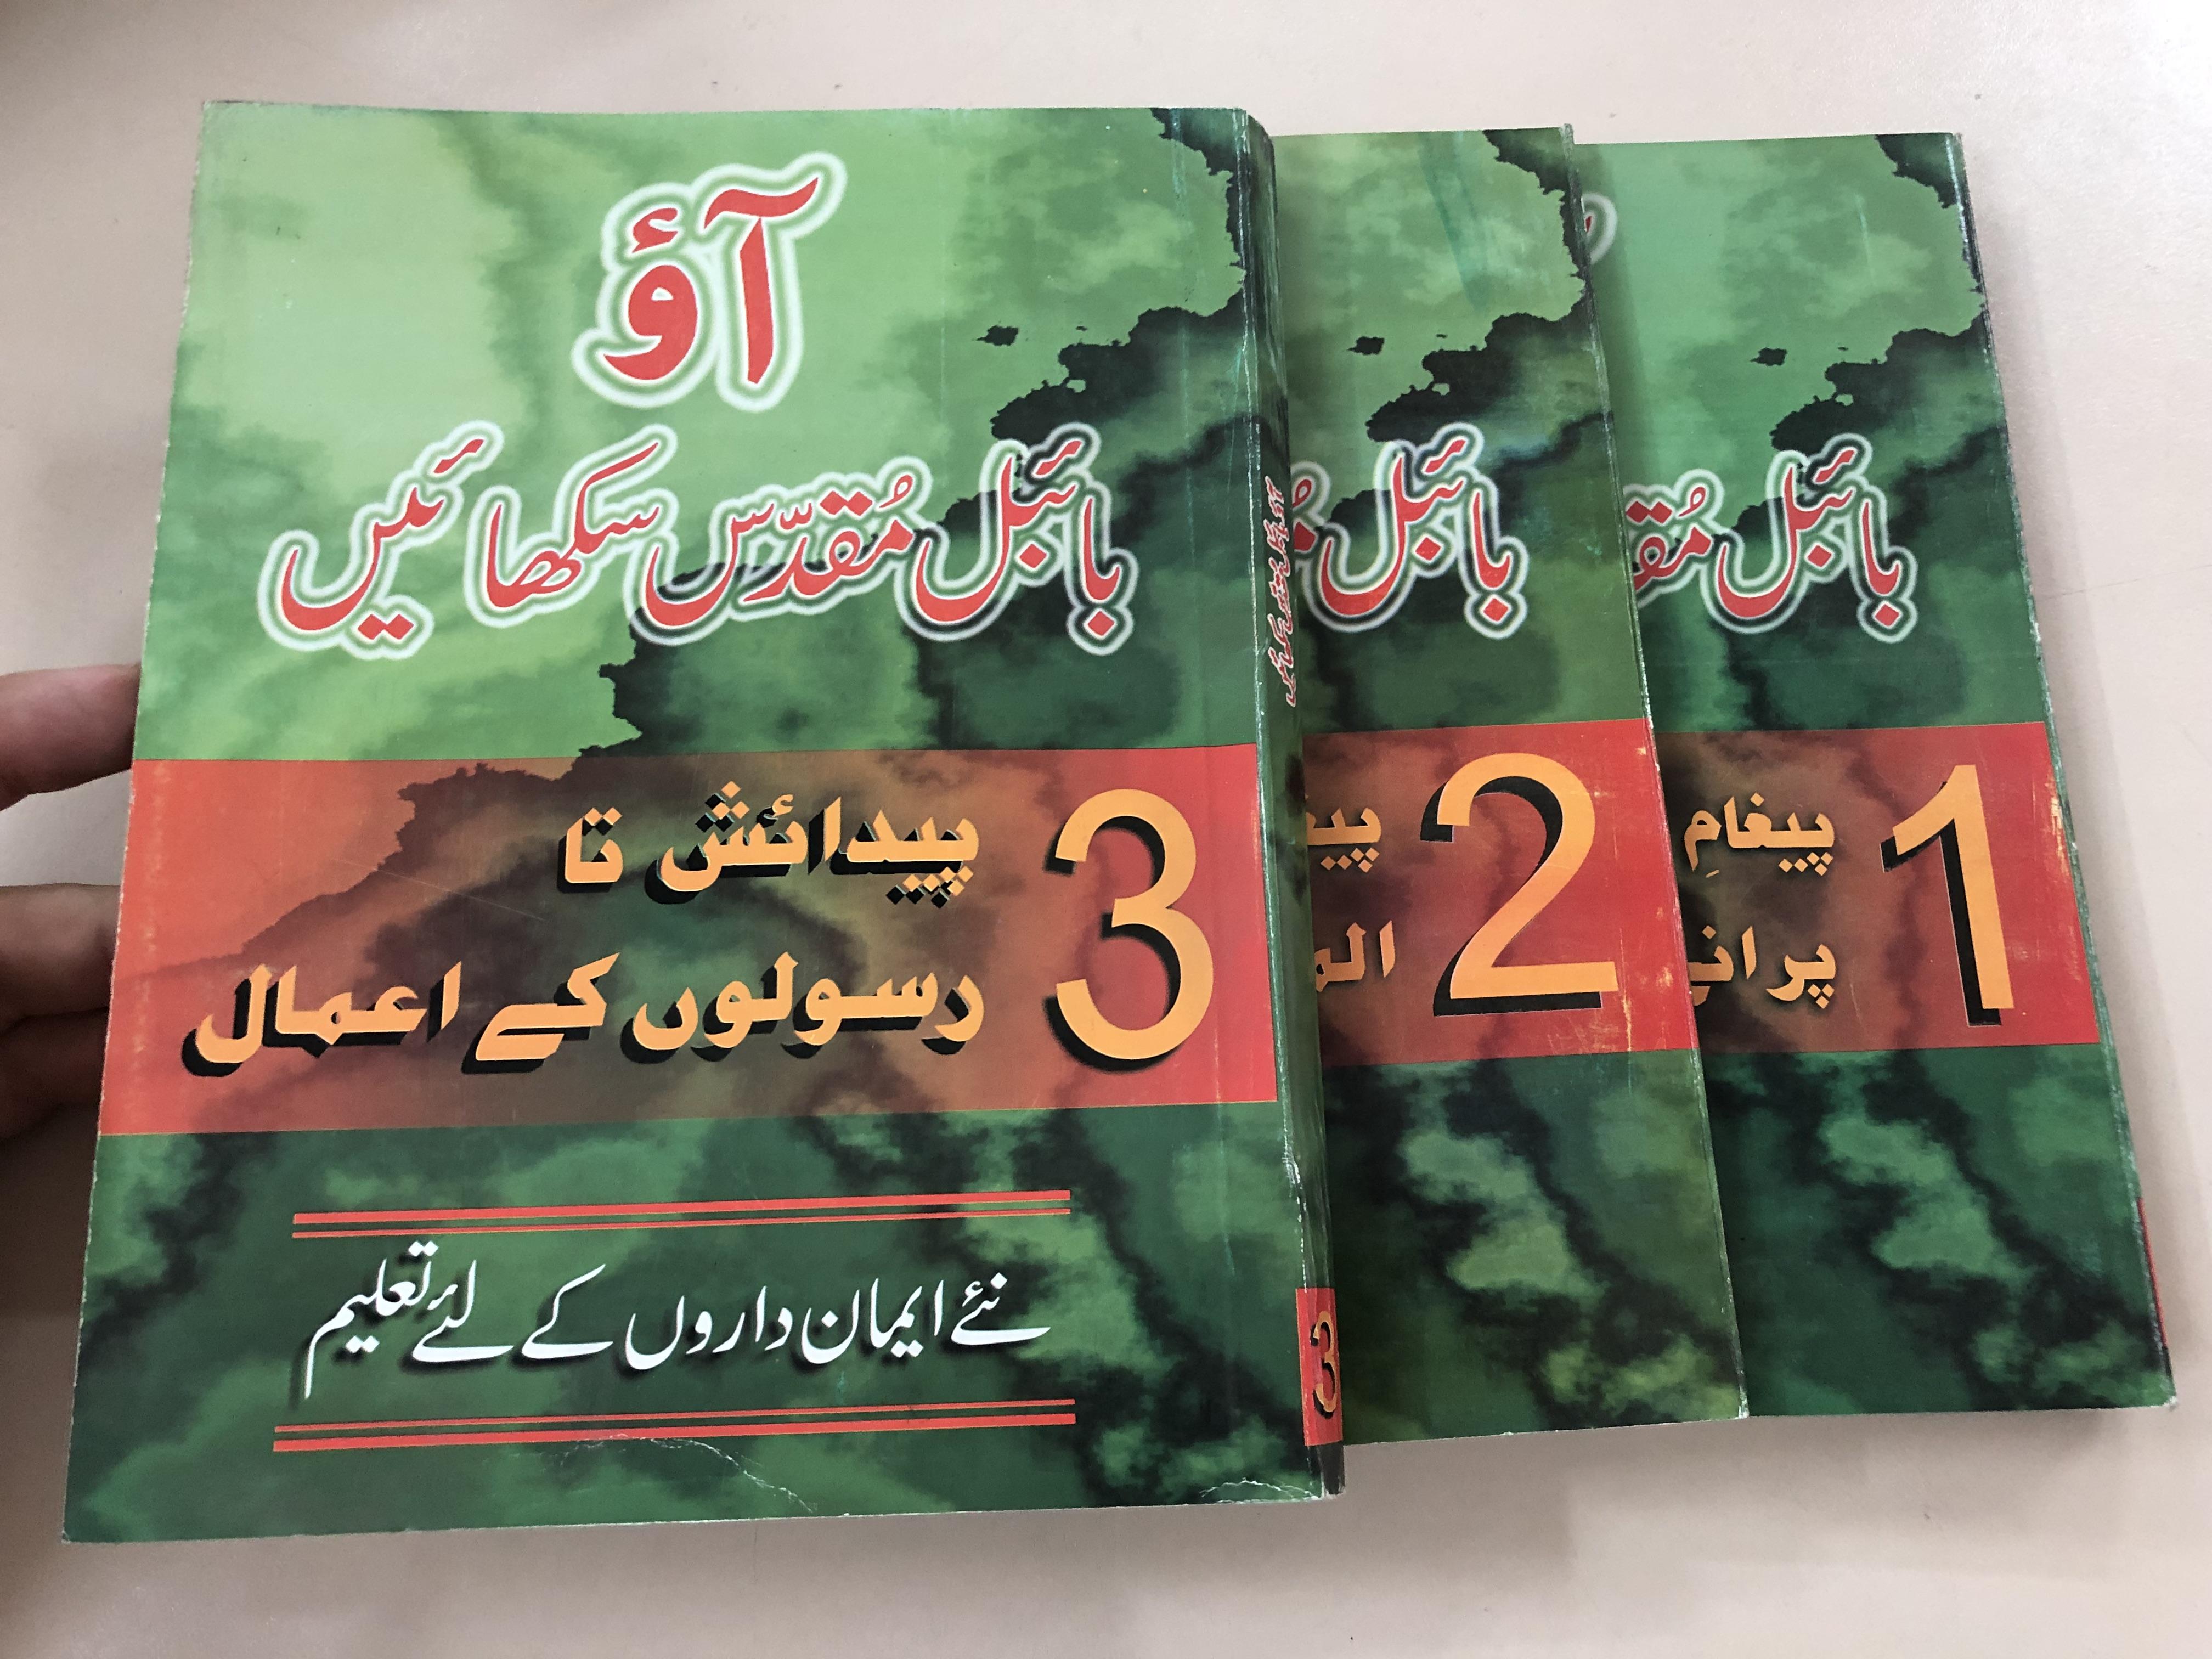 urdu-translation-of-building-on-firm-foundations-vol.1-3.jpg